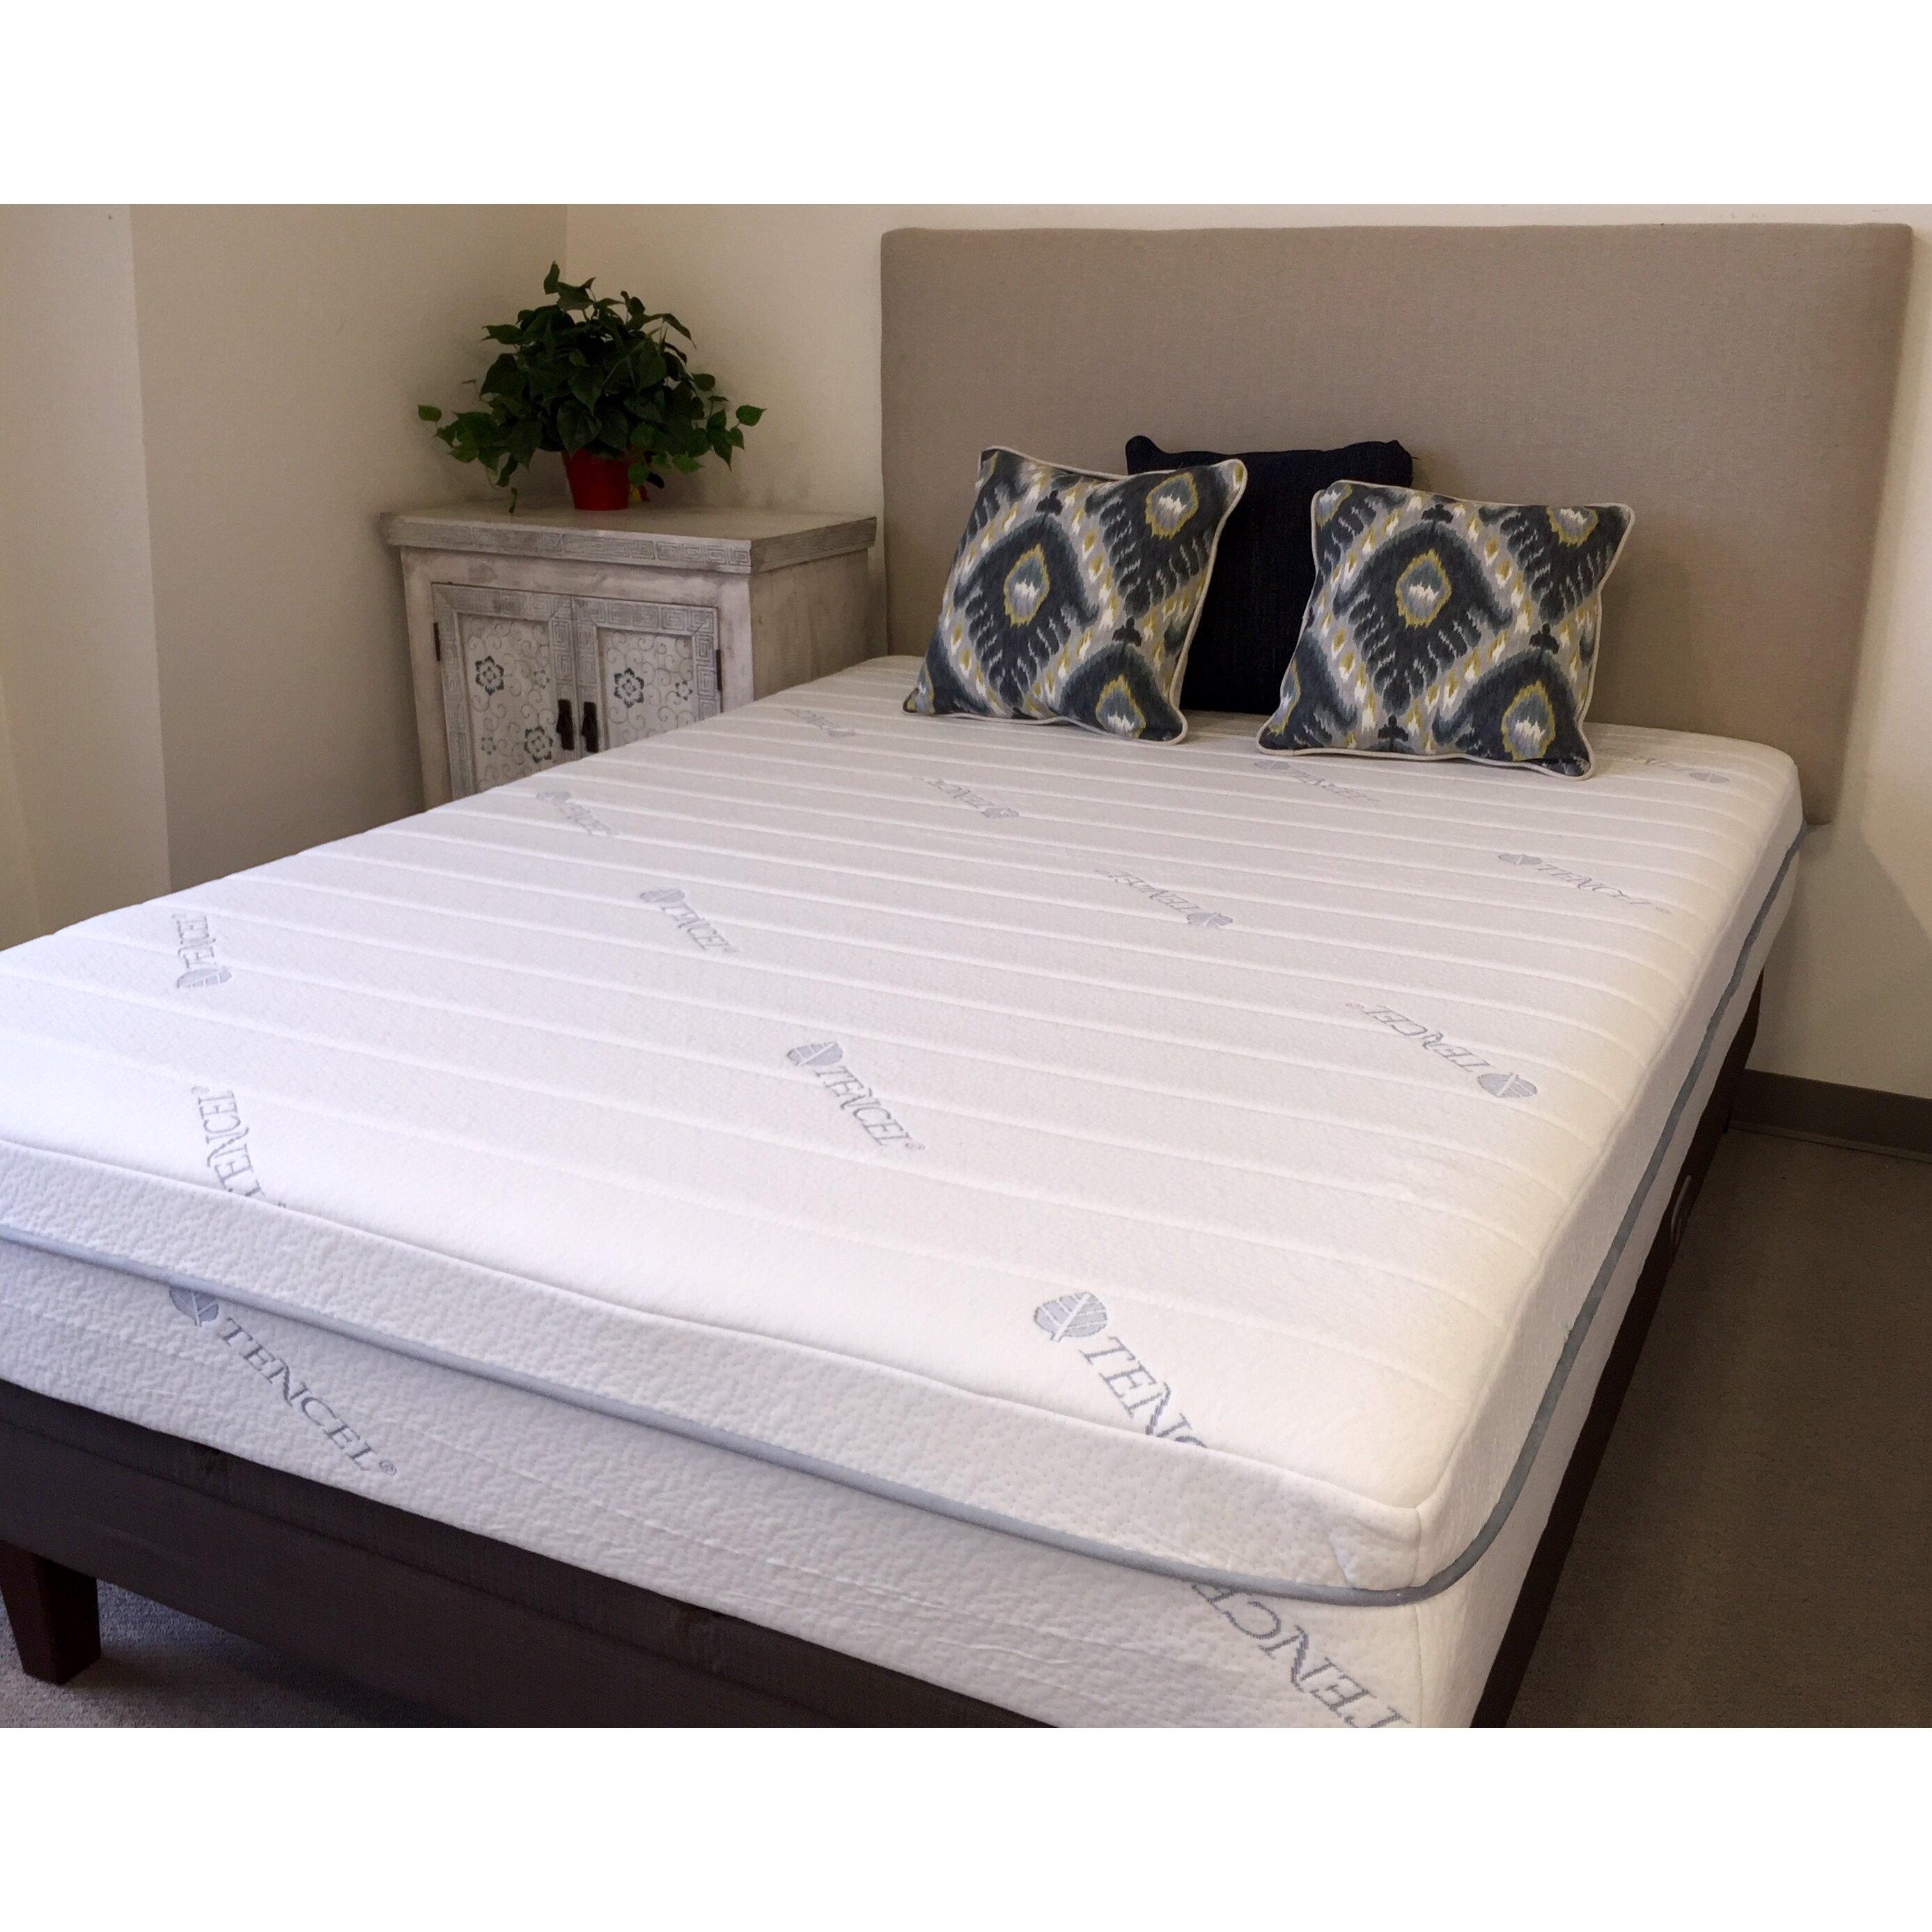 ikea foam mattress 72 hours best ikea furniture